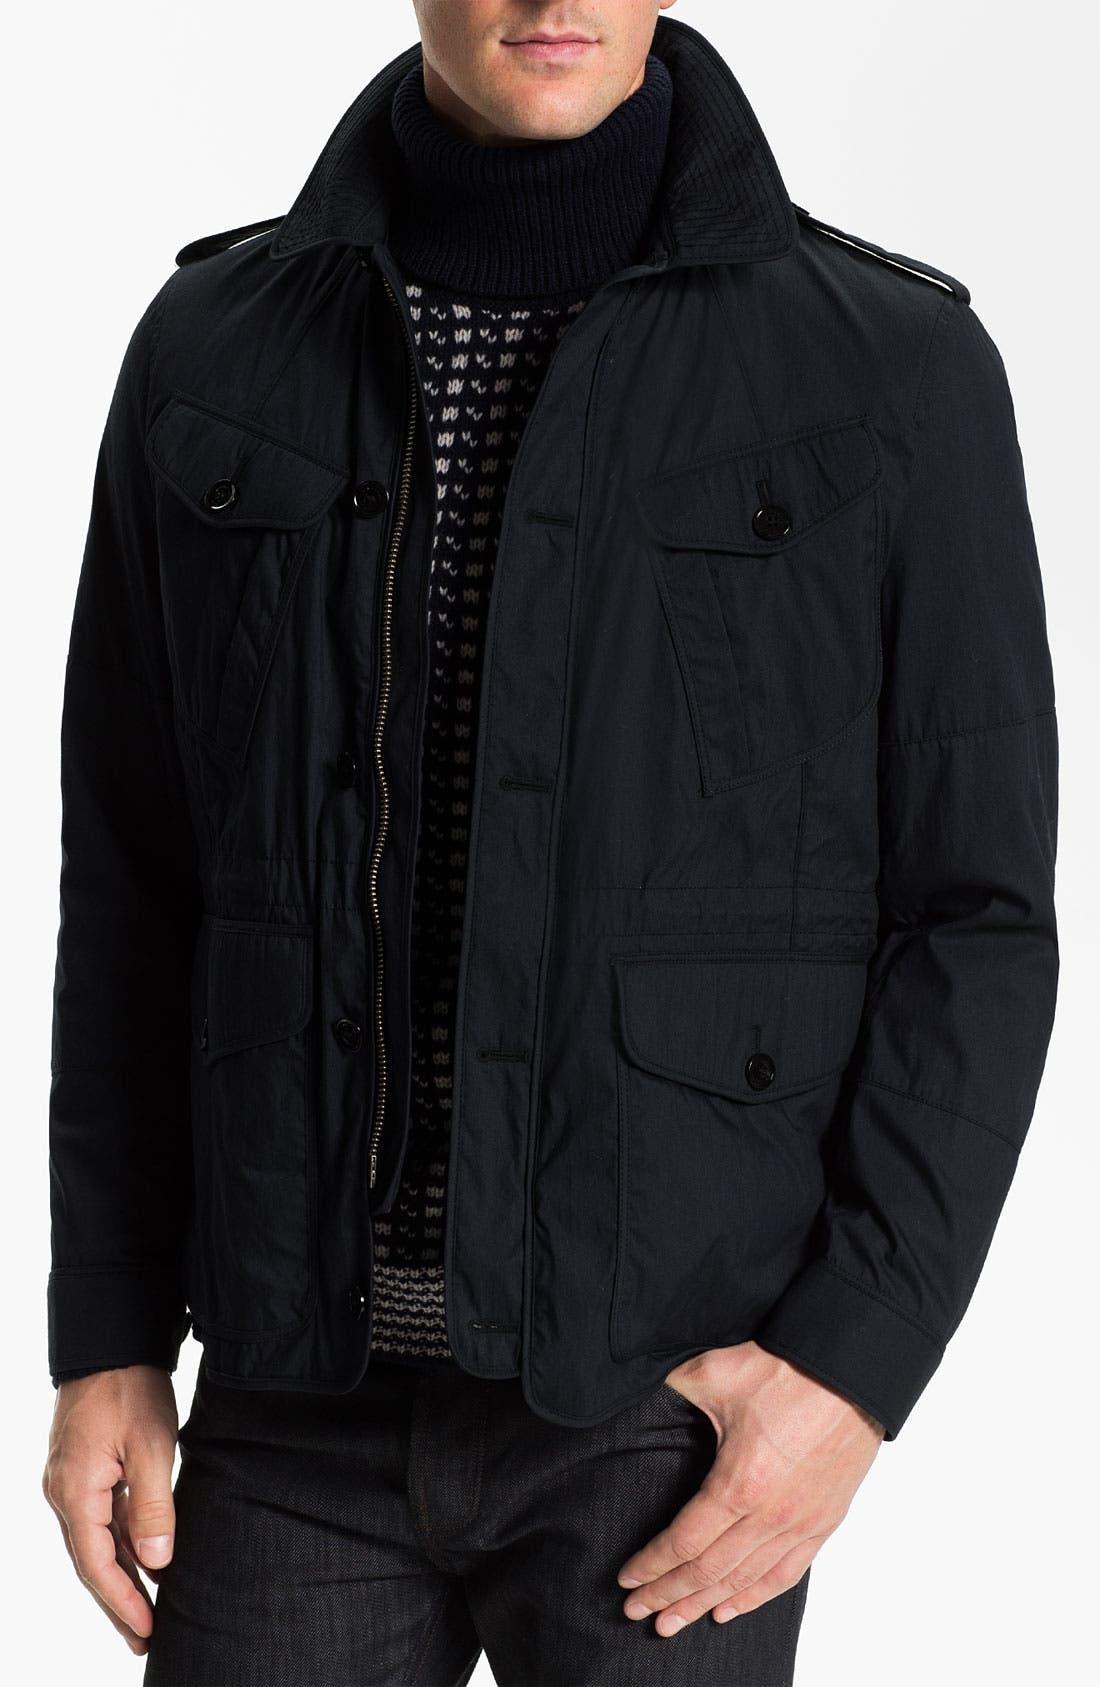 Main Image - Burberry Brit Field Jacket